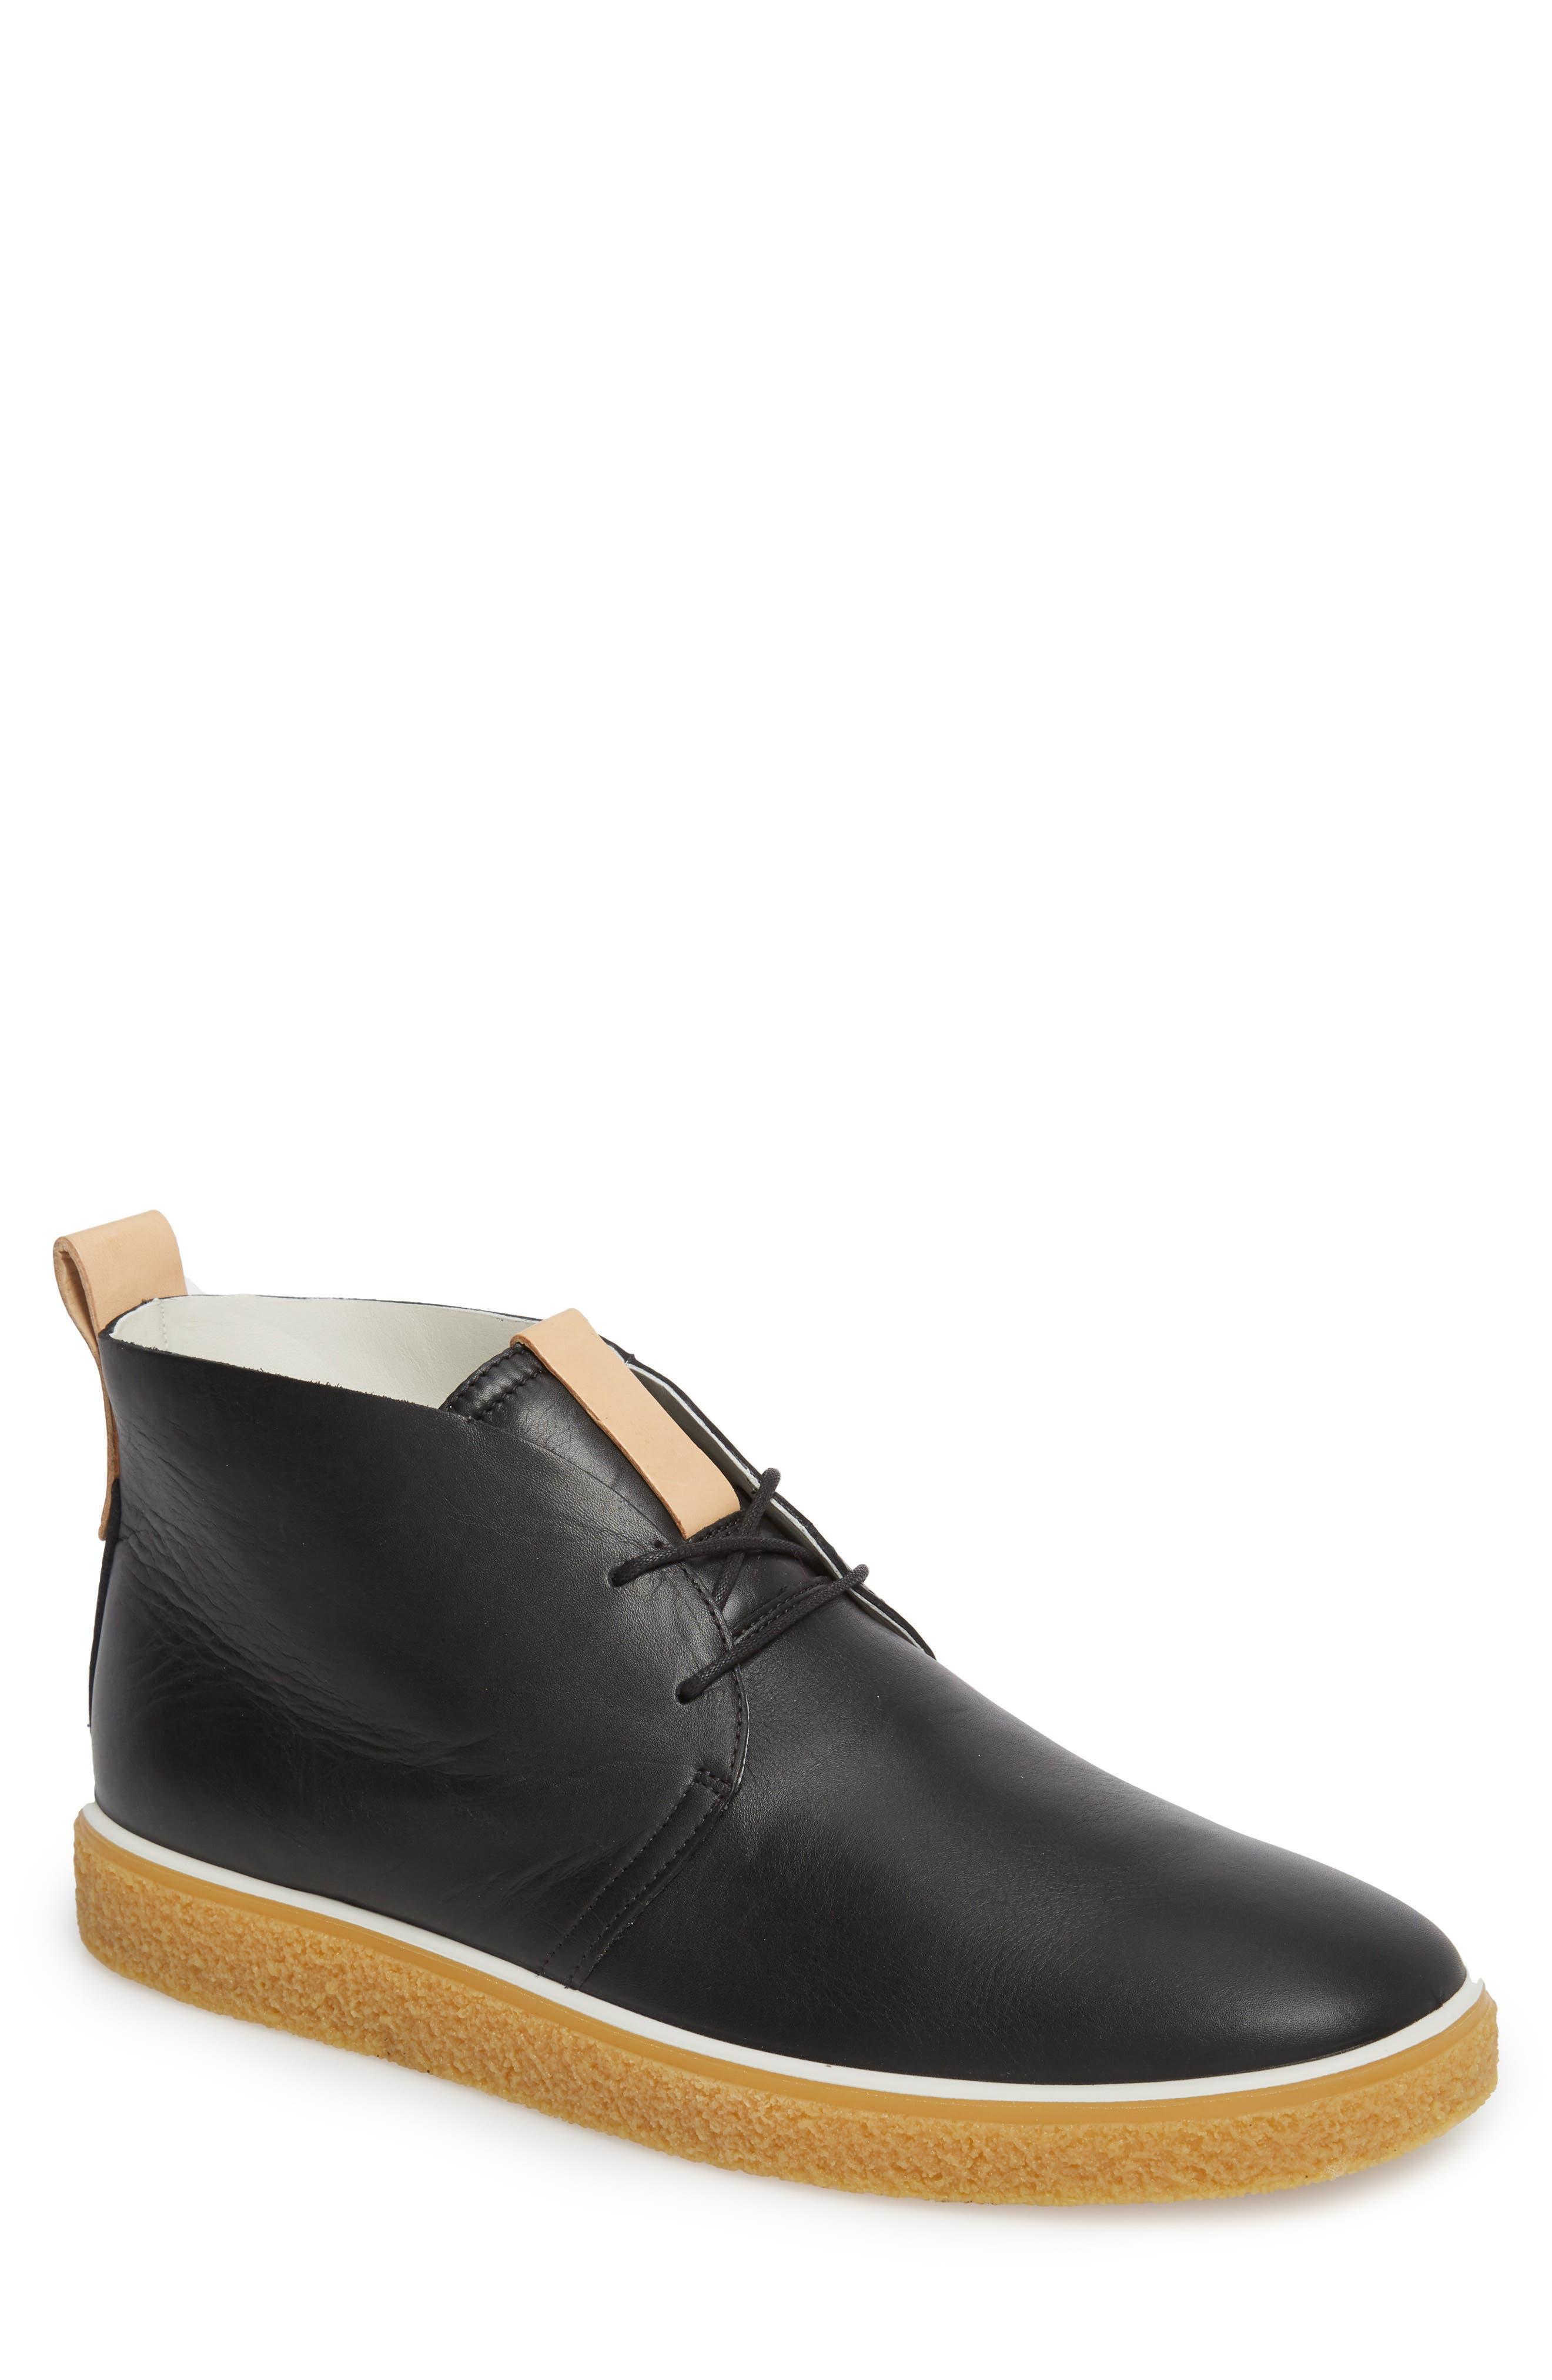 Crepetray Chukka Boot,                         Main,                         color, 001